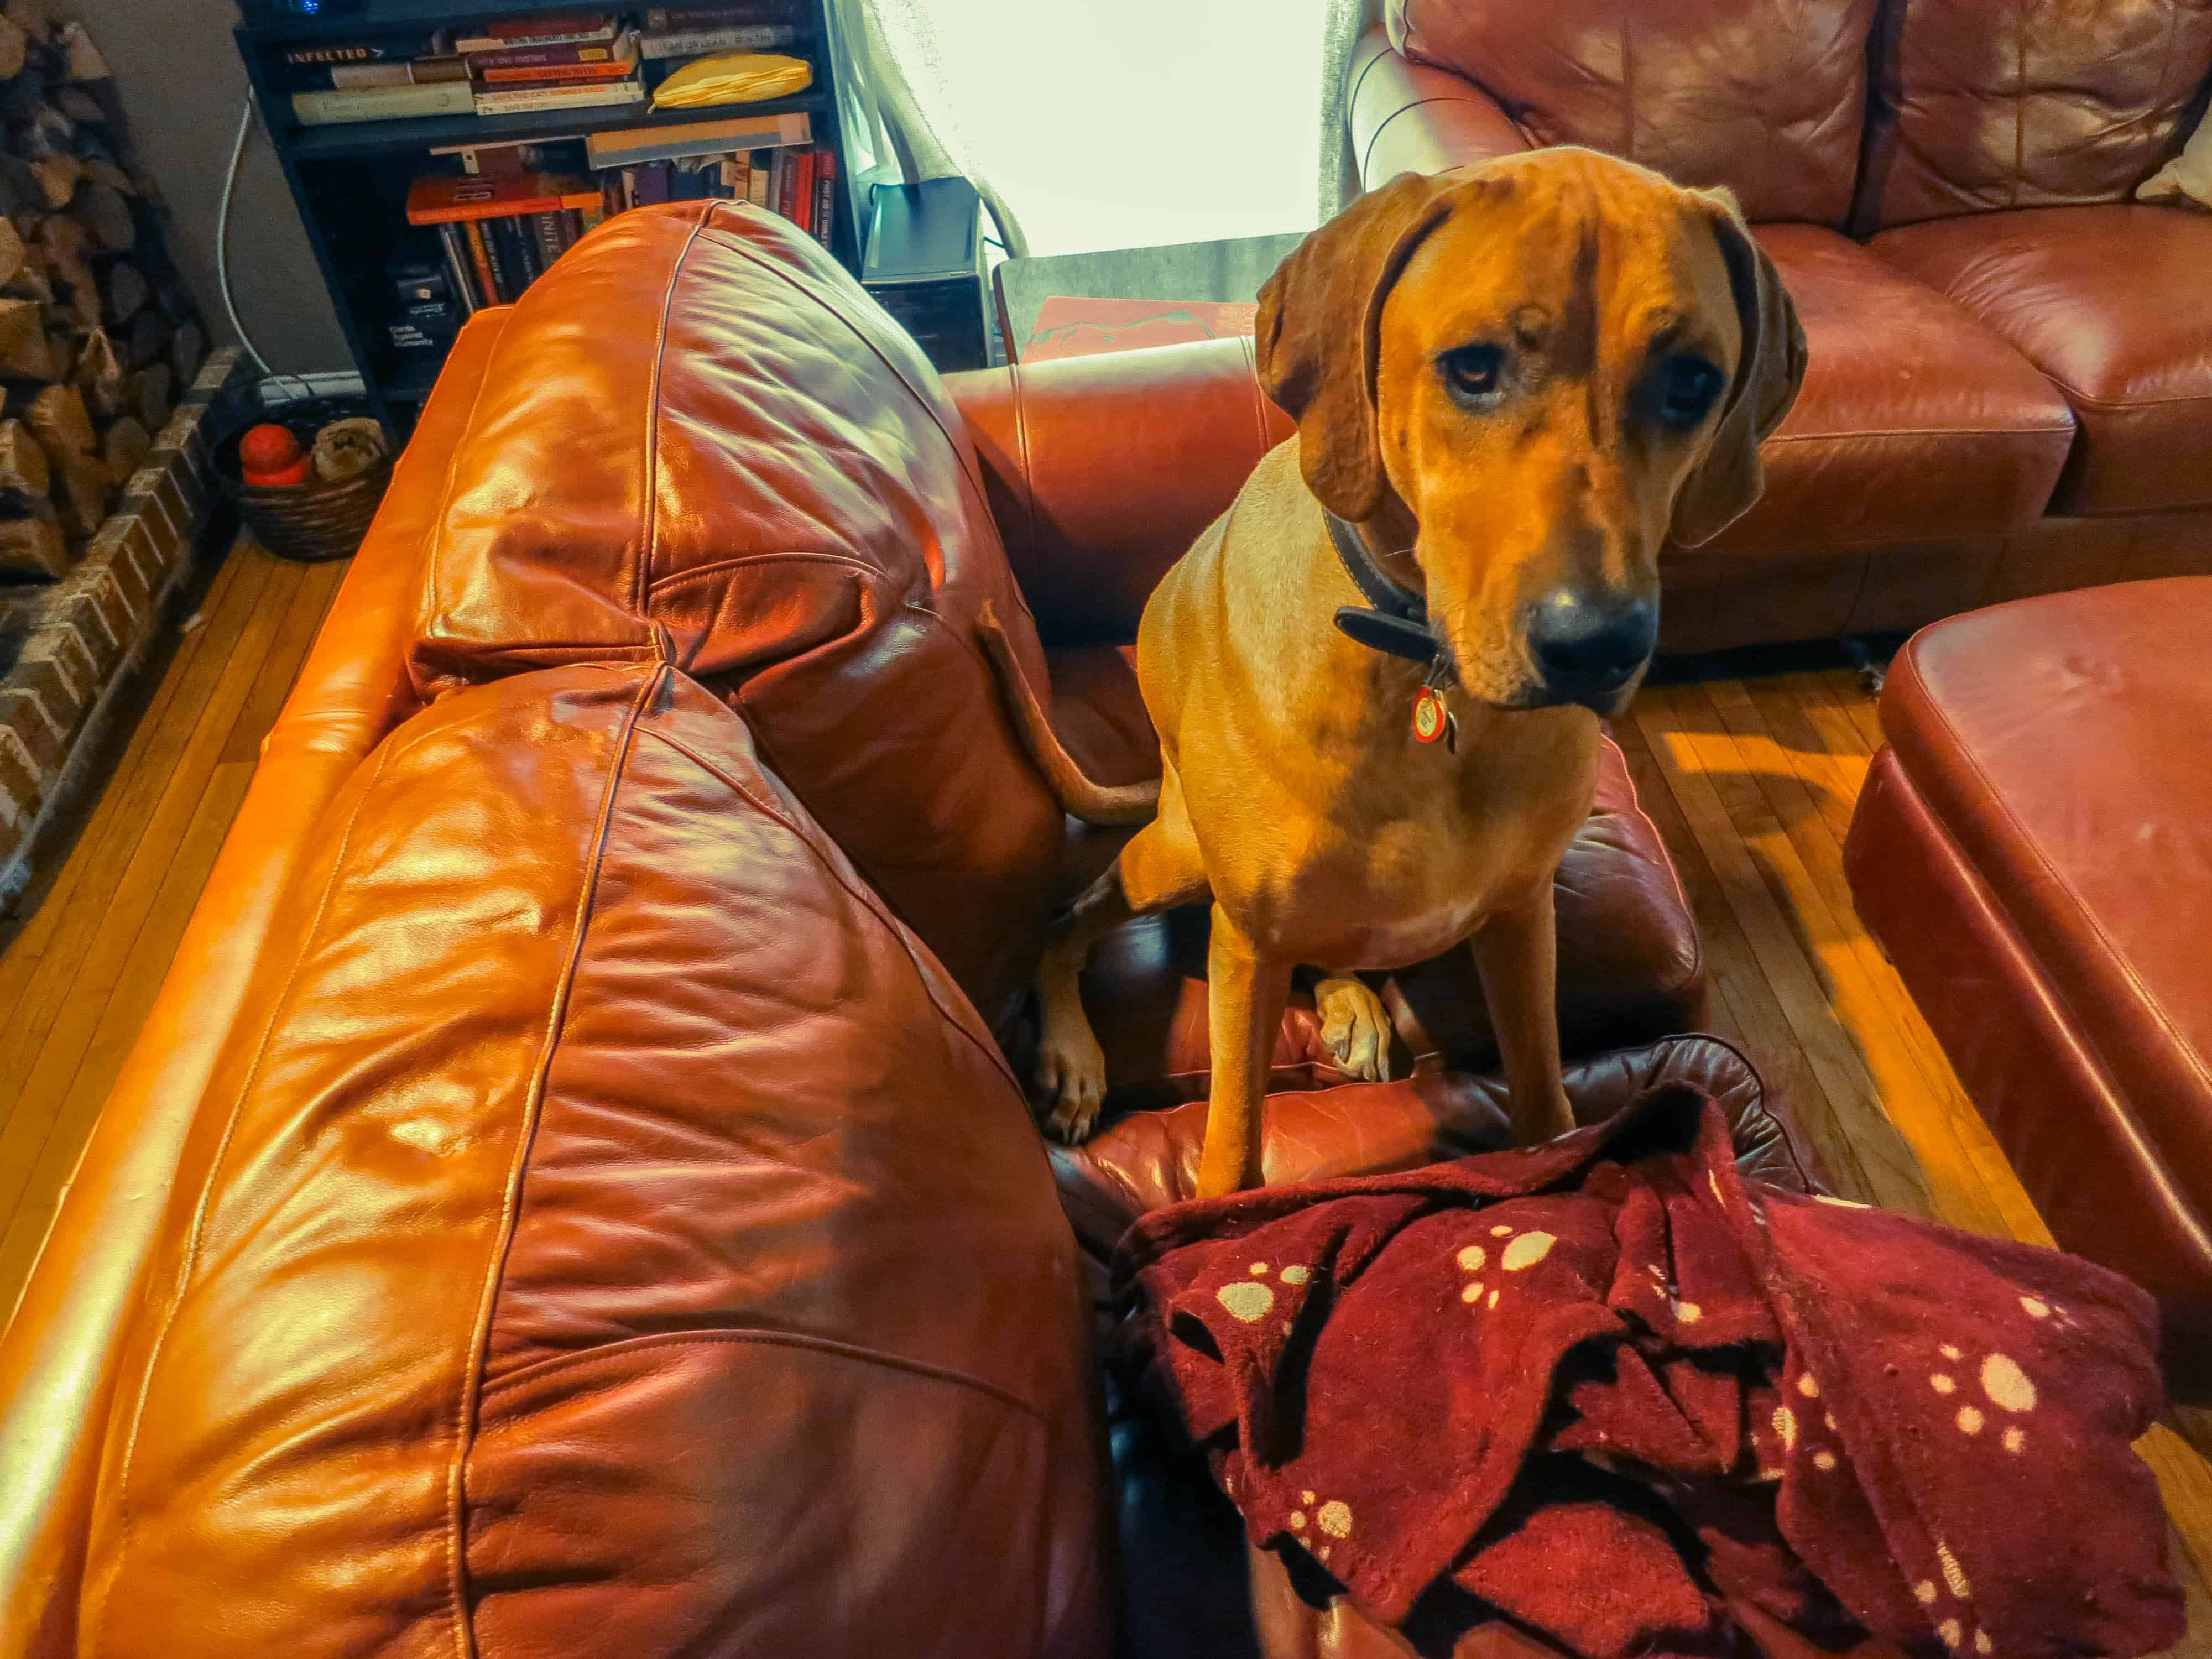 Rhodesian Ridgeback, Rhodesian Ridgeback photos, marking our territory, dog blog, dog adventure, pet adventure, petcentric, dog loves couch, funny